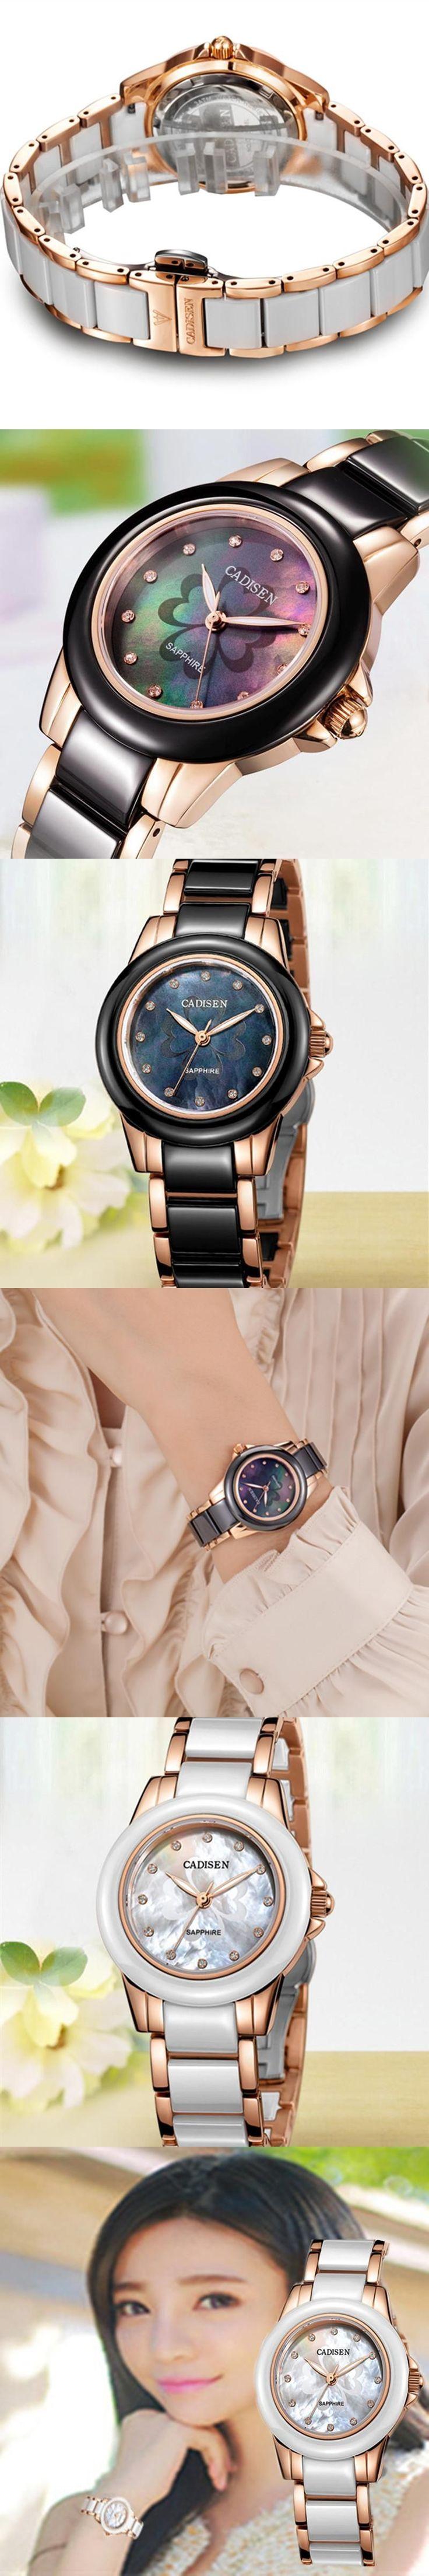 CADISEN ladies watch woman top brand name De Luxe girl leisure ceramic wristwatch Clock ladies watches Relogio Feminino watches